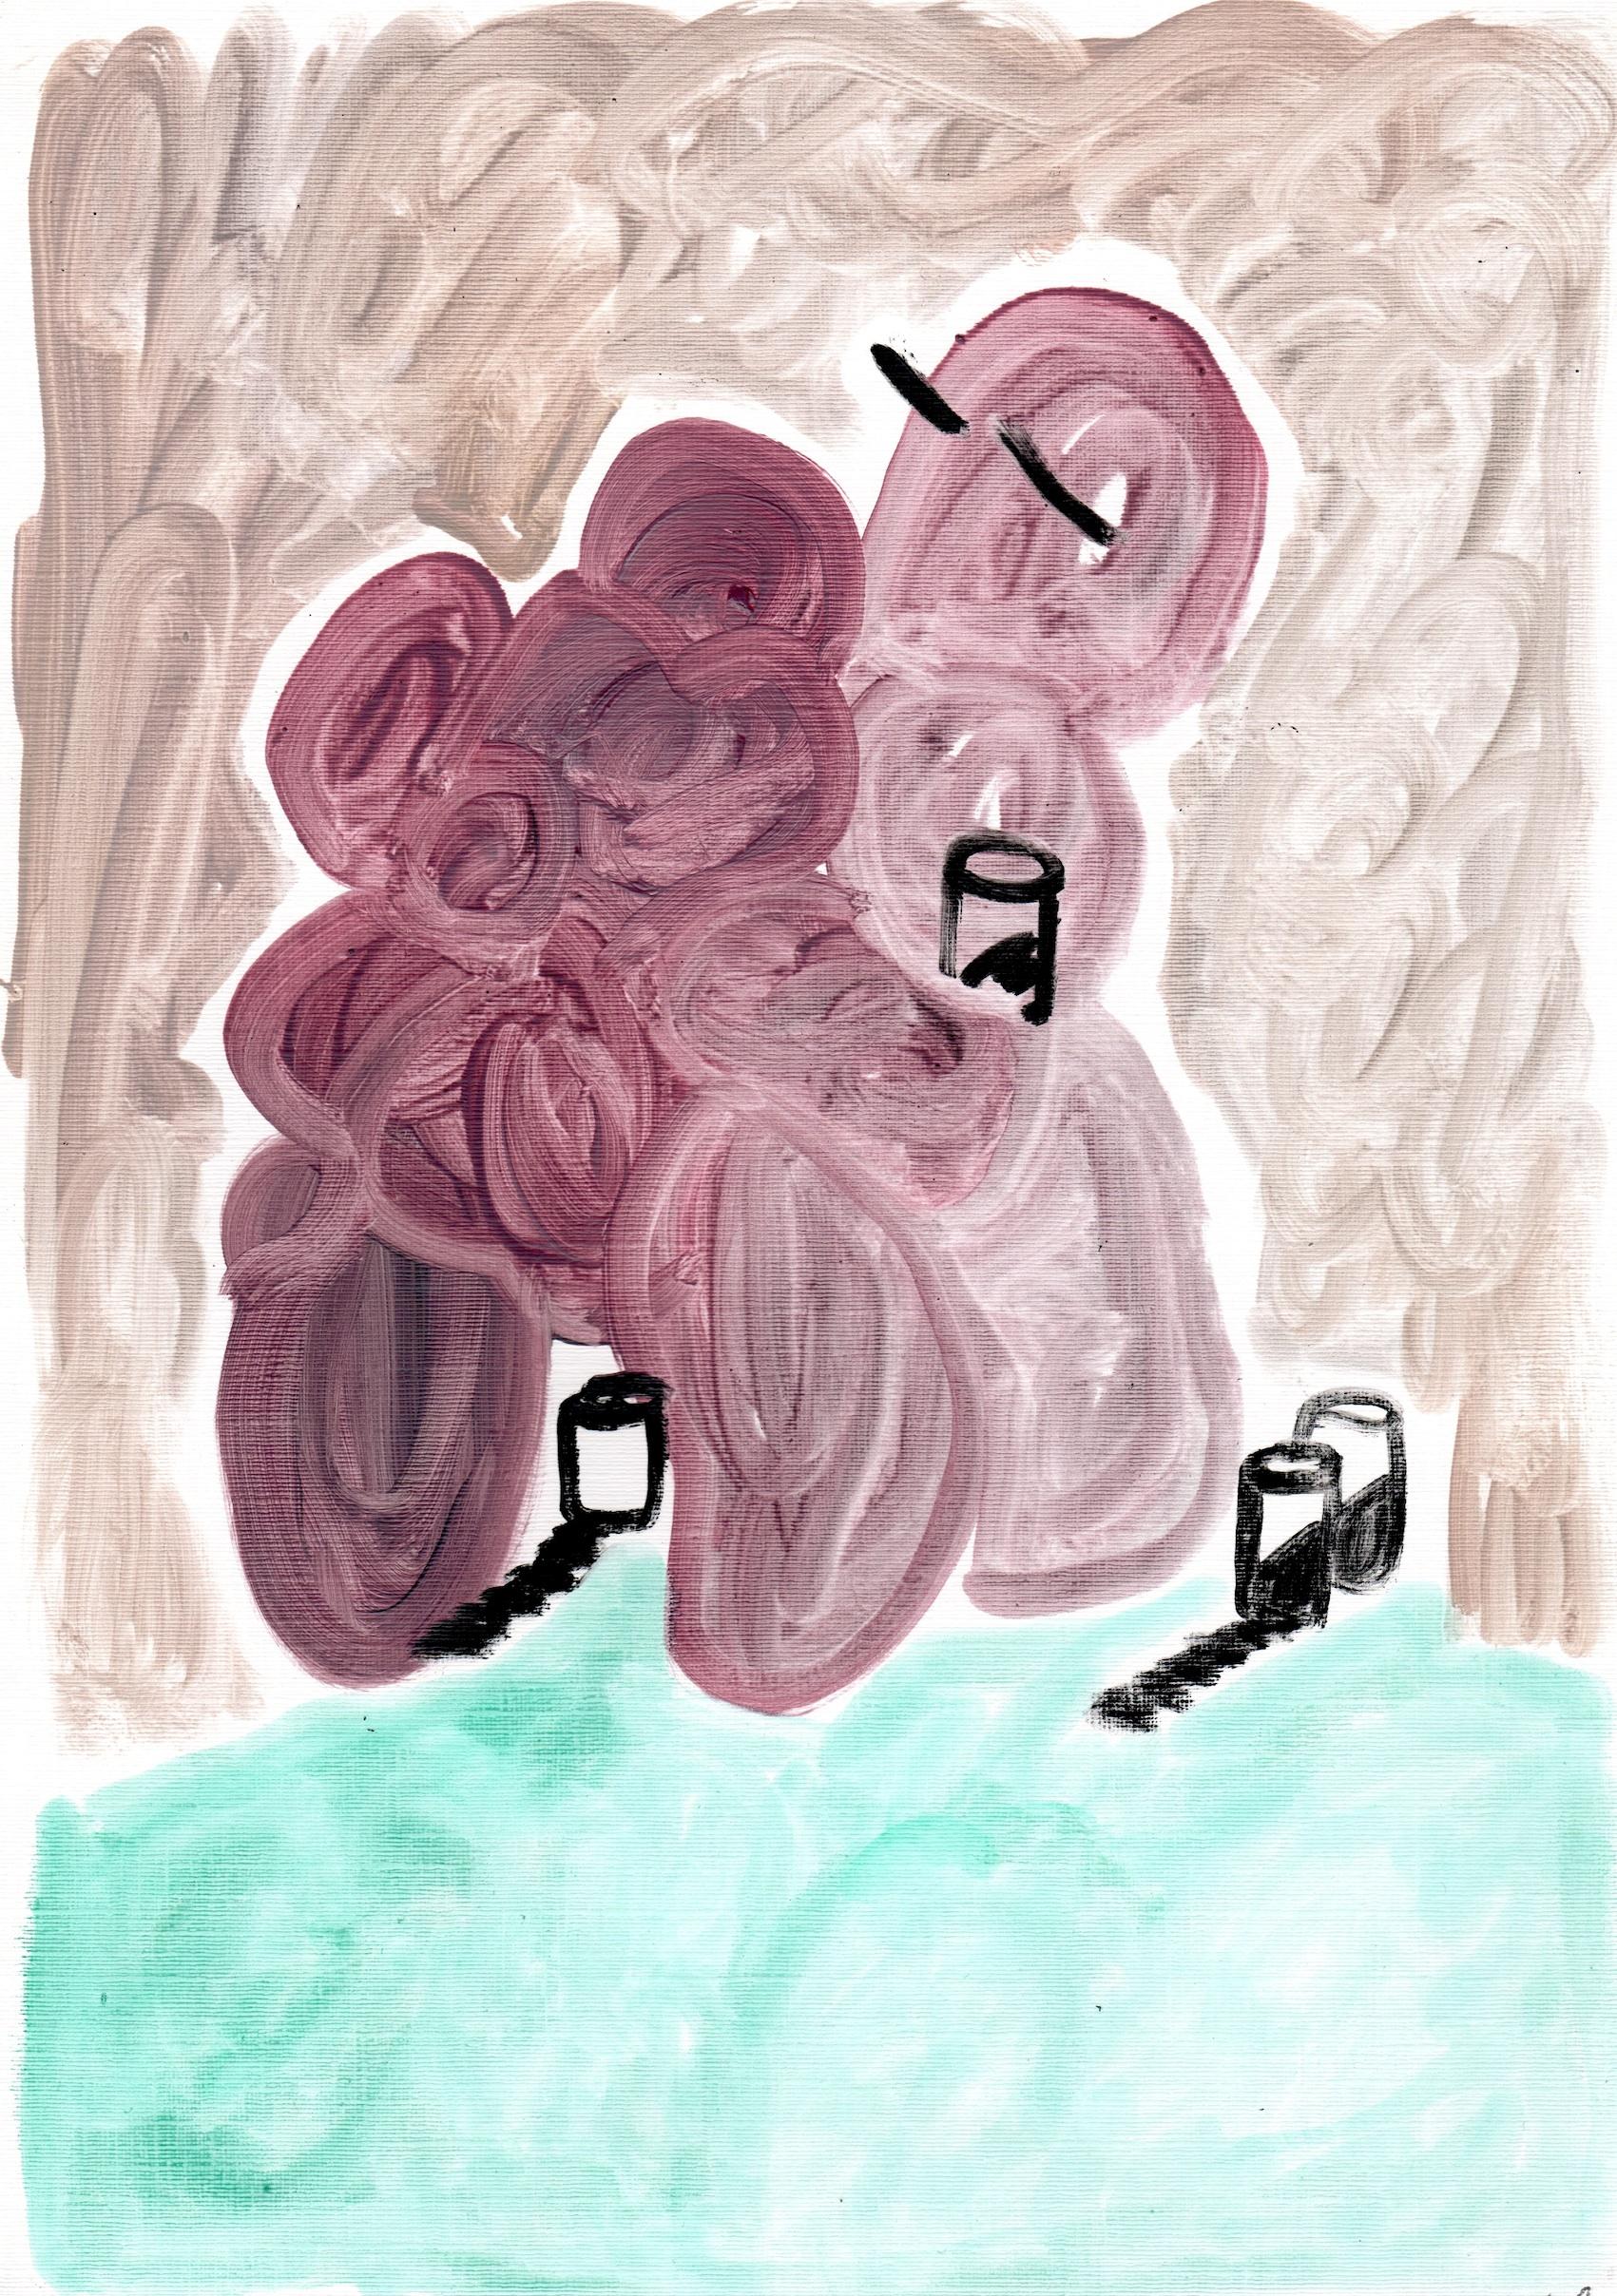 PISSHEADS#3